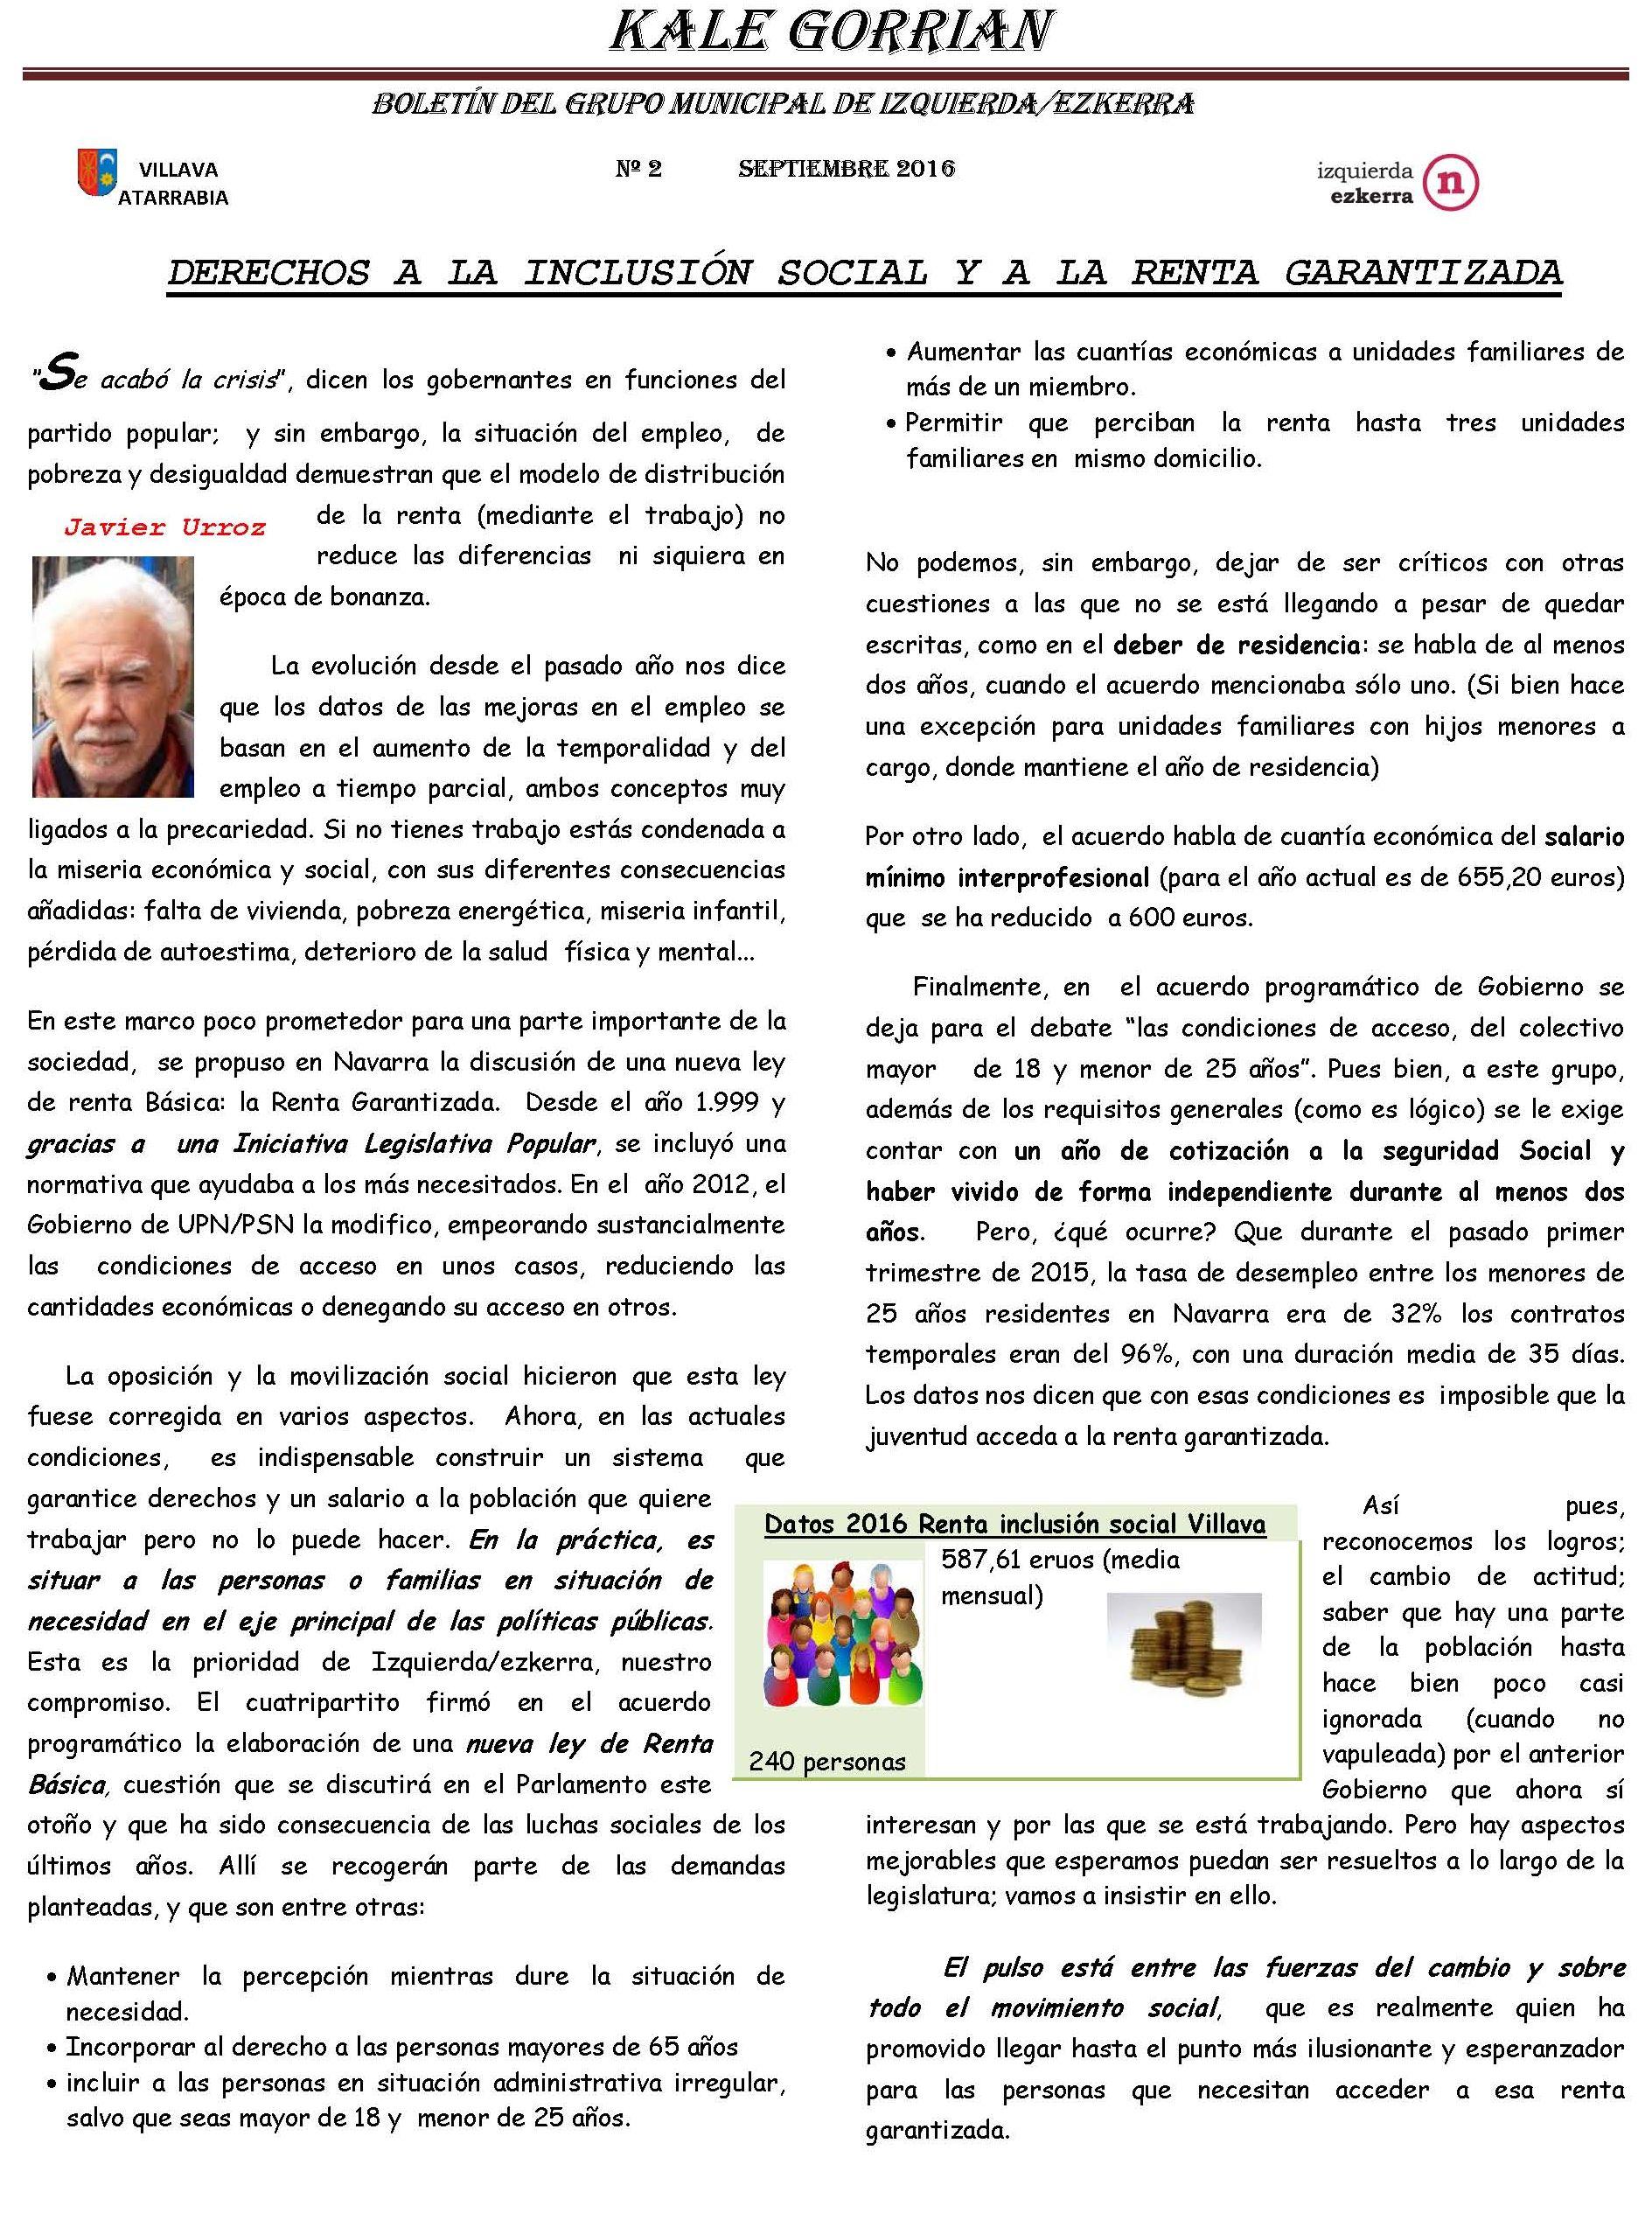 Boletín Informativo del grupo Izquierda Ezkerra Villava-Atarrabia. 2º Semestre 2016